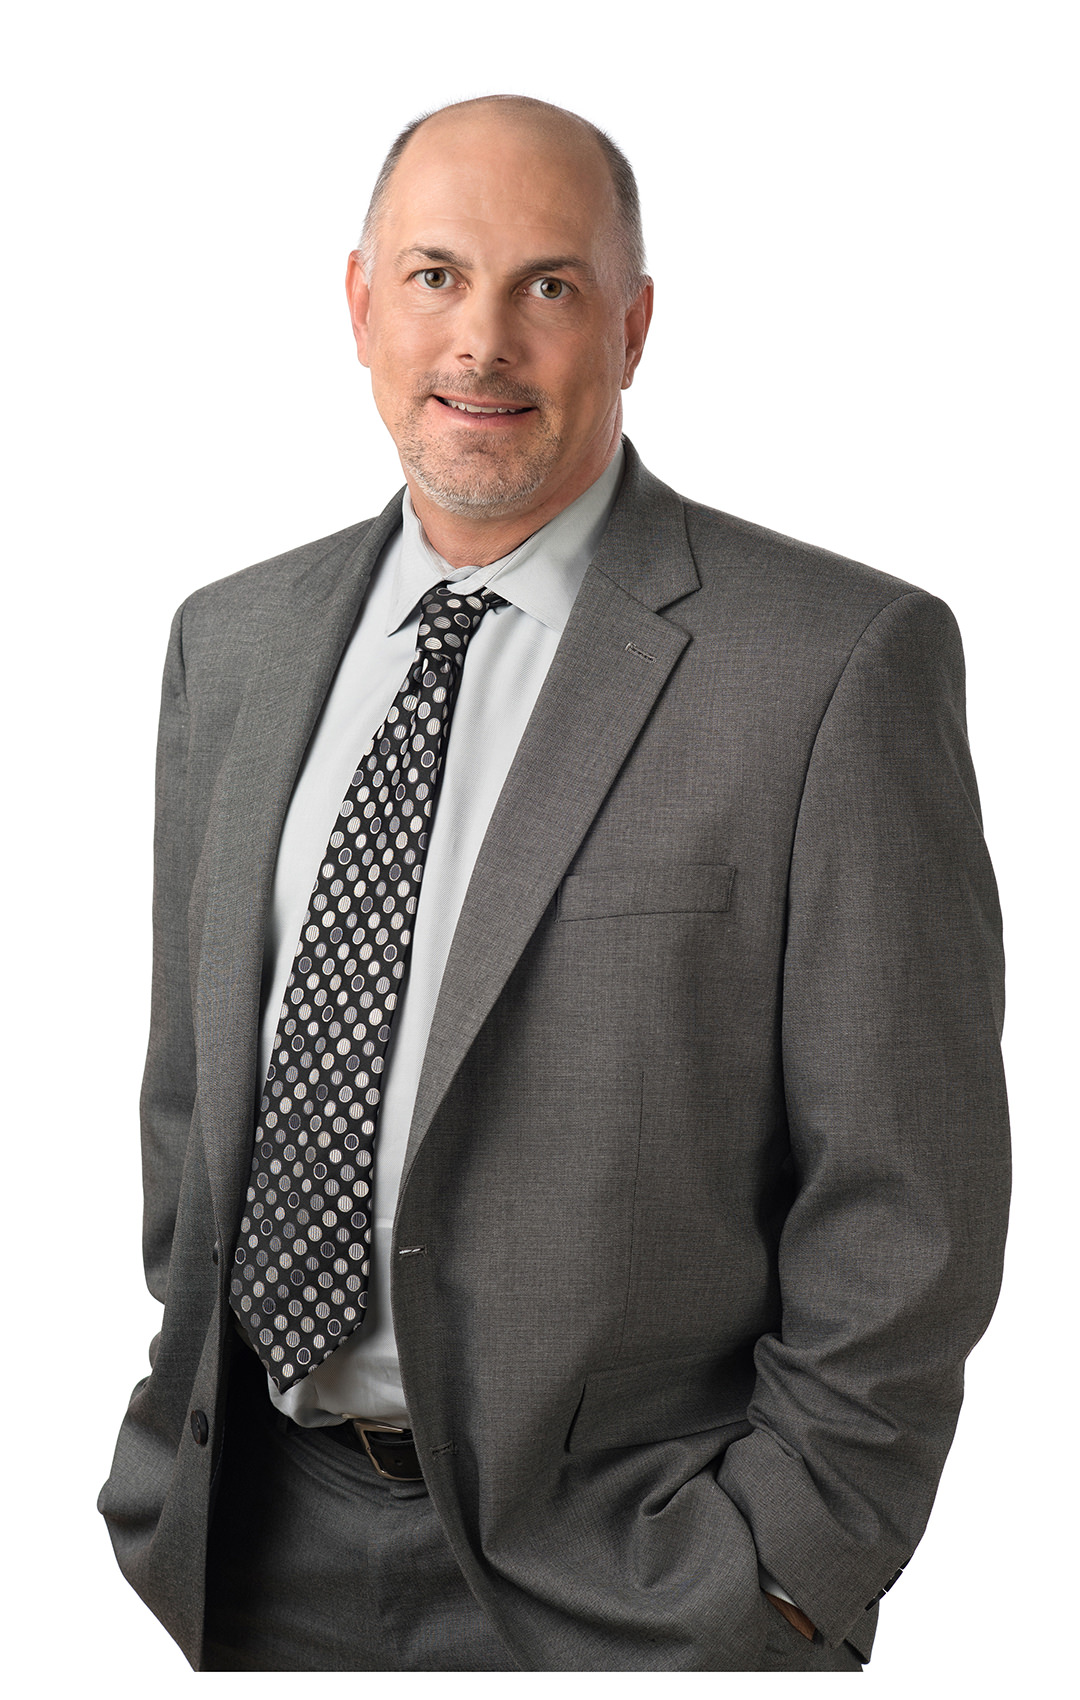 Michael K. Rafter